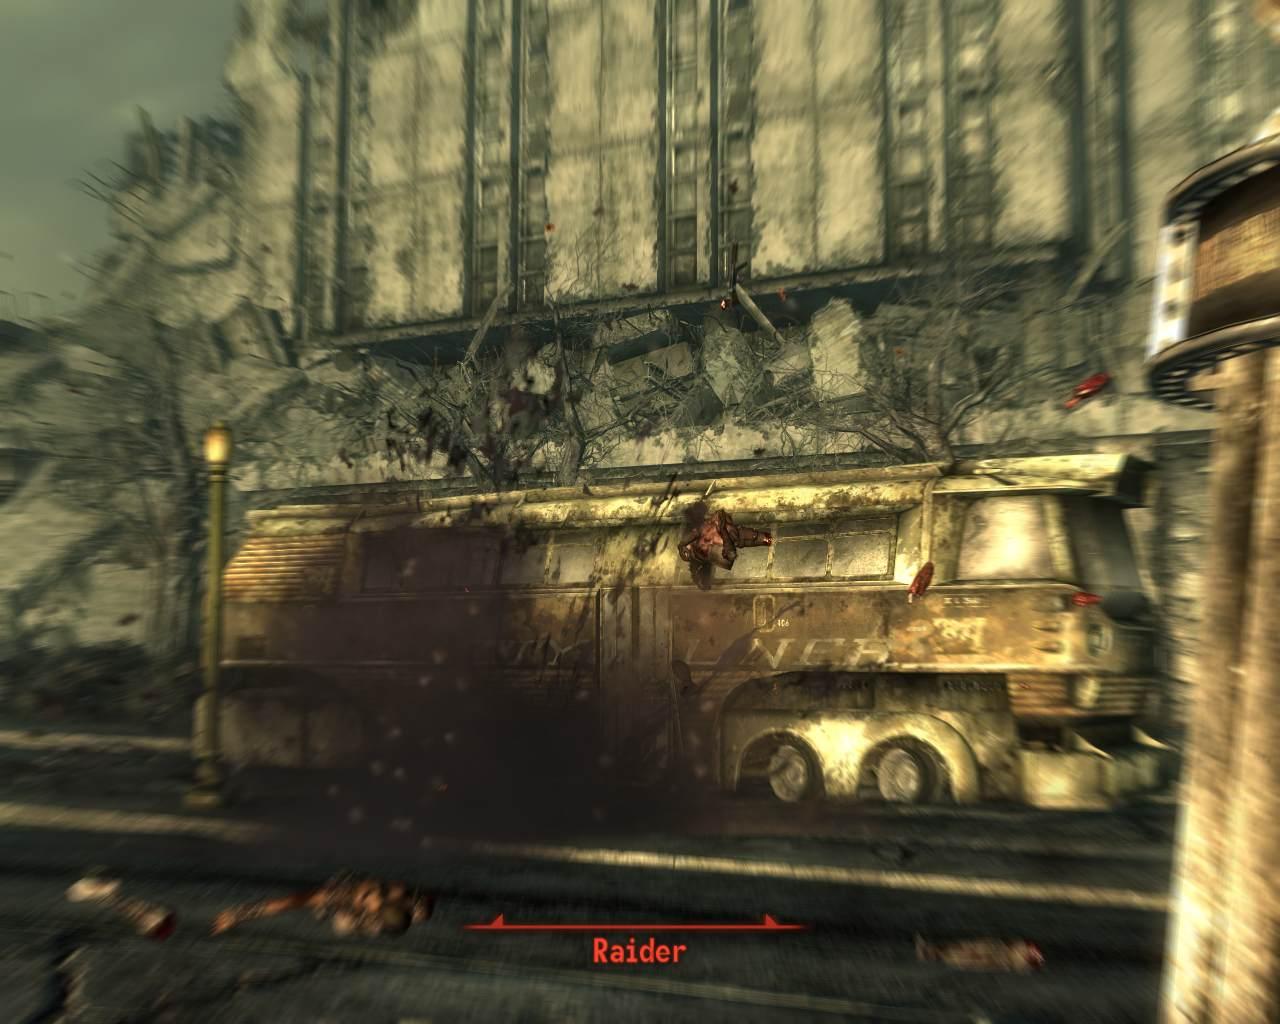 fallout 3 screenshots i took